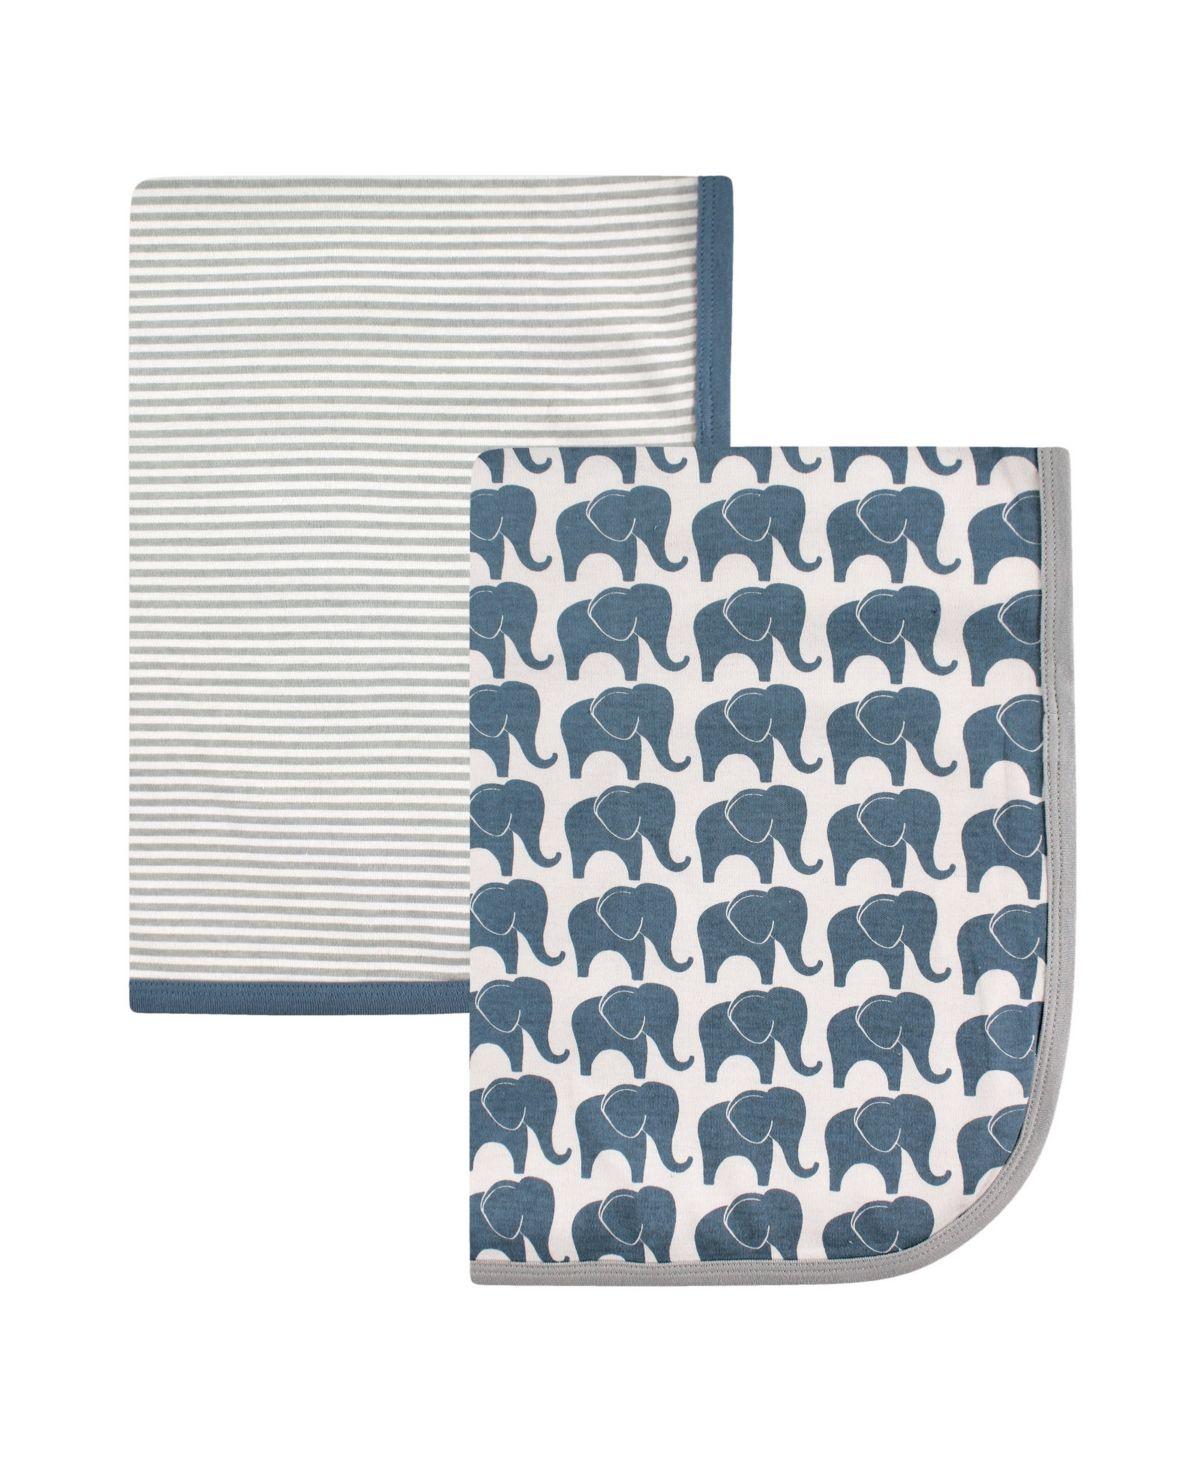 CUTE ANIMALS Hudson Baby 2 x 100/% Interlock Cotton Boy Baby Swaddle Blankets NEW